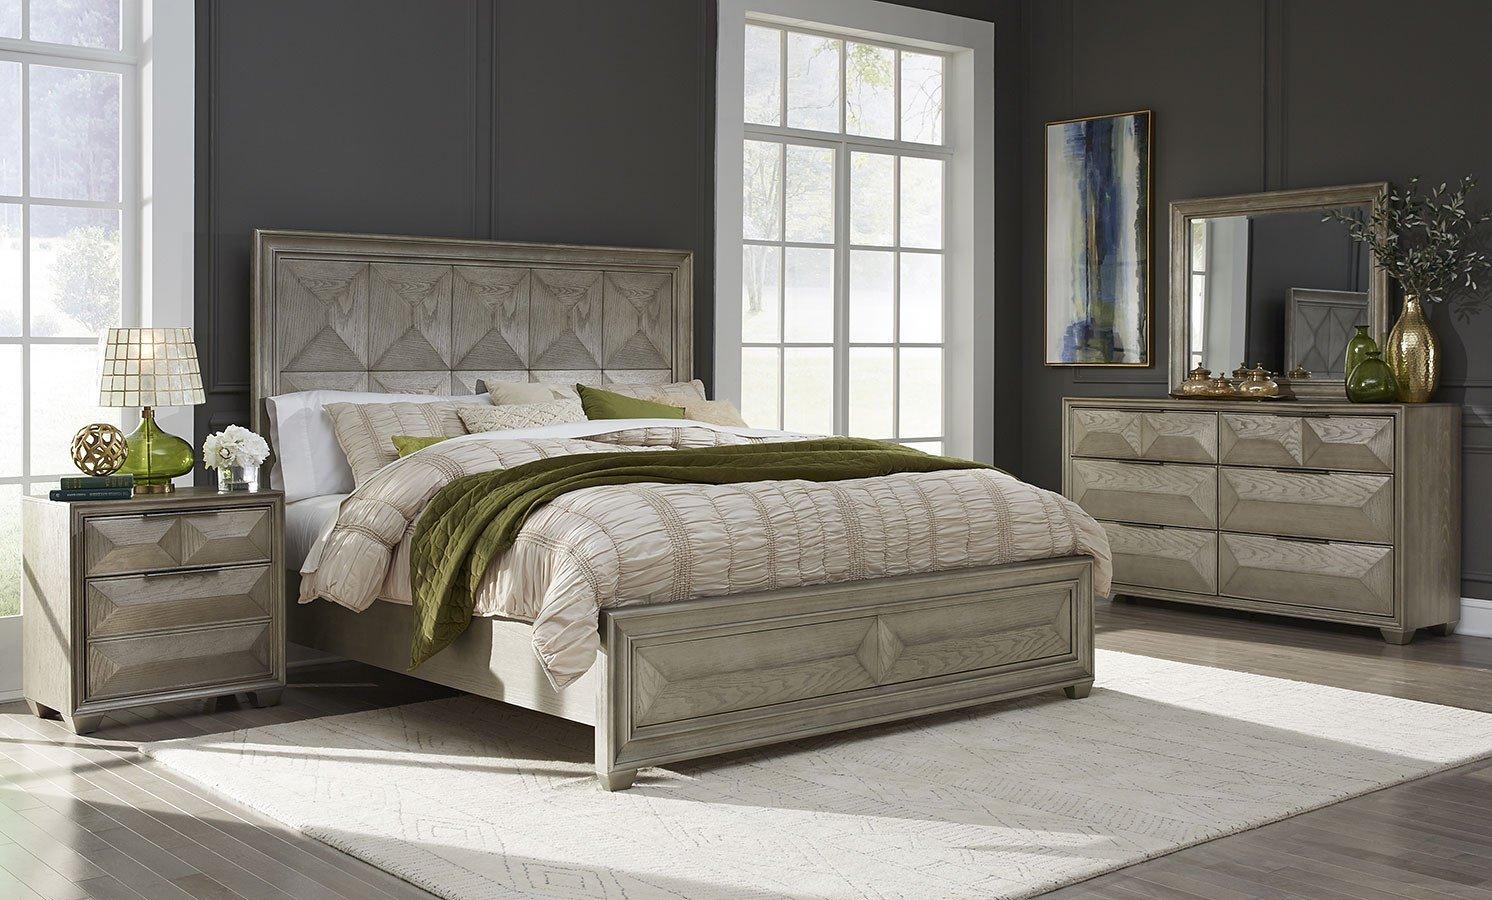 Ashley Furniture Silver Bedroom Set Beautiful soho Panel Bedroom Set